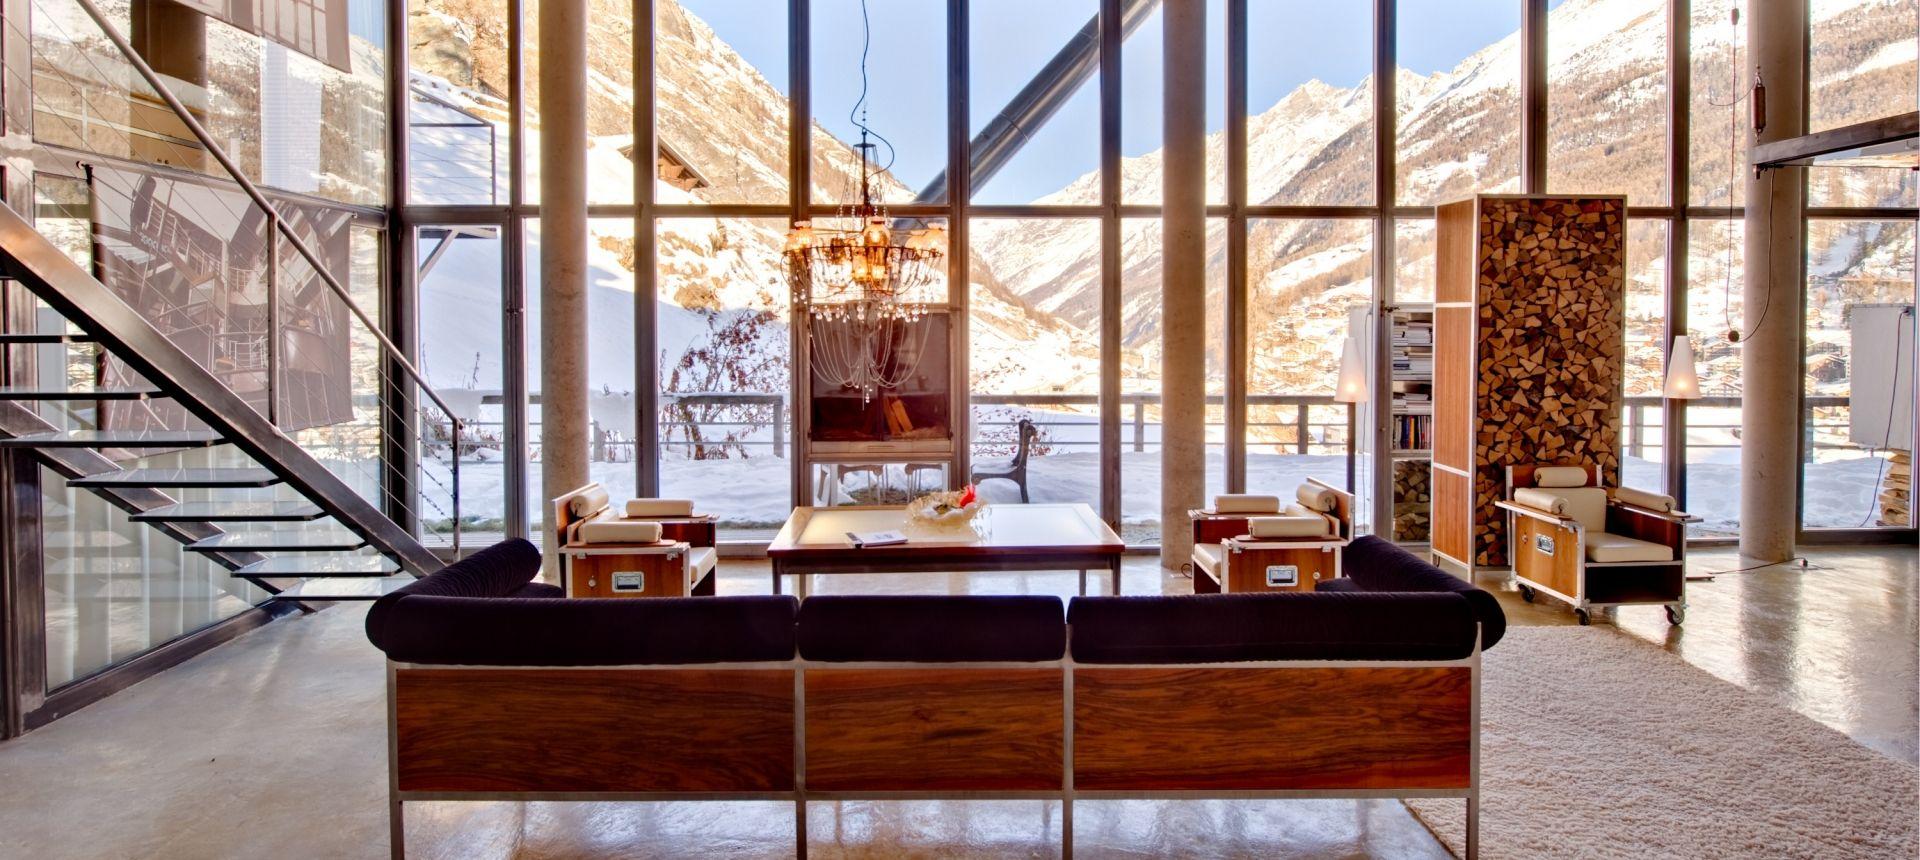 5 Design Lofts Penthouses Zwitserland Reizen Nobeach